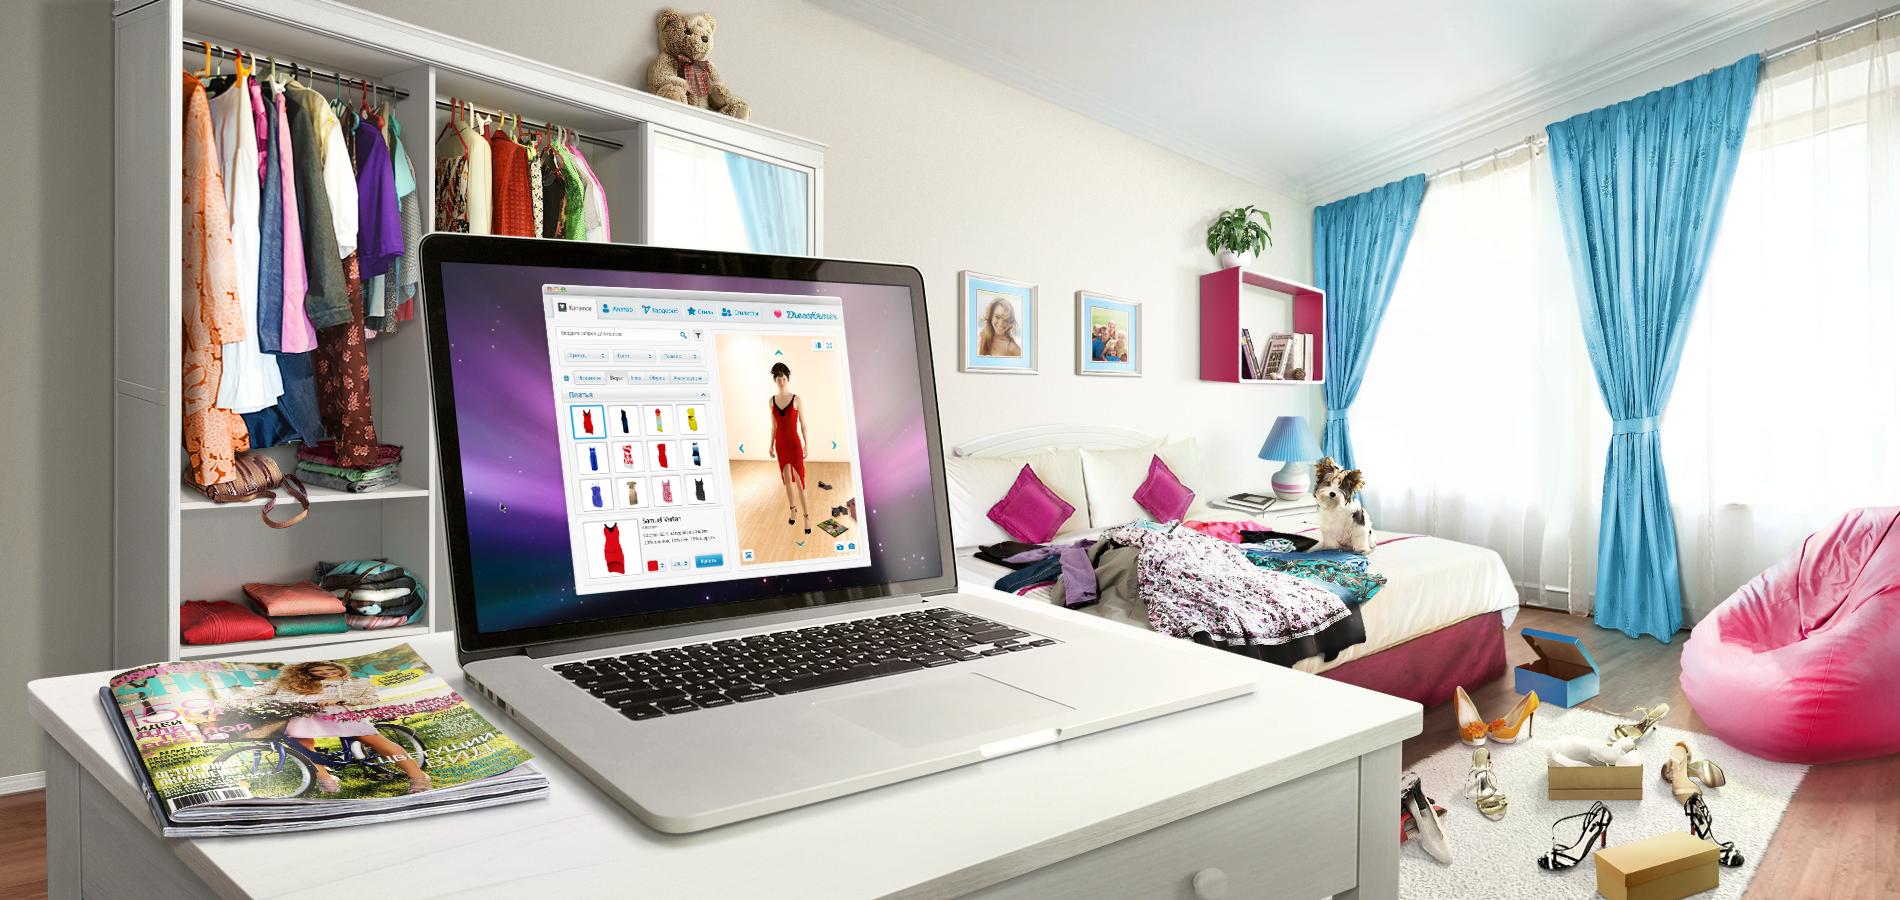 Ebay cosa guider lo shopping online per la casa for Shop online casa